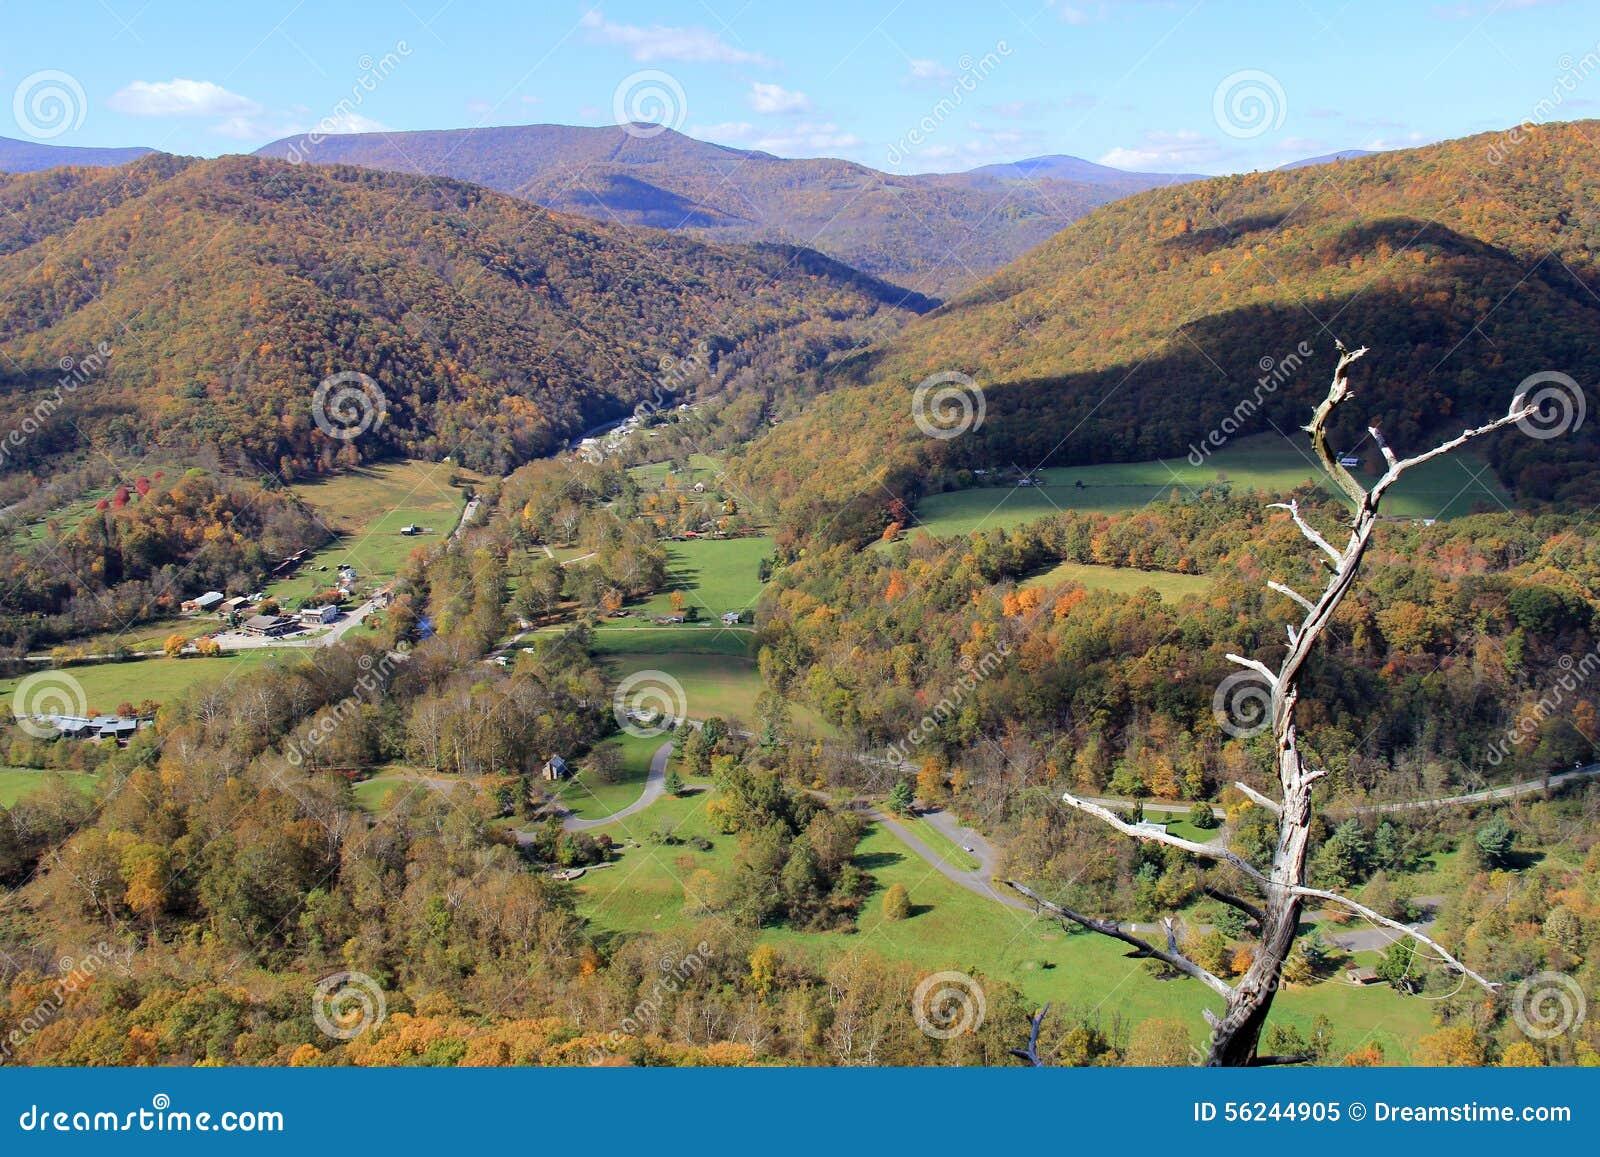 Seneca Rock In Fall Appalachian Mountains West Virginia USA - Usa virginia